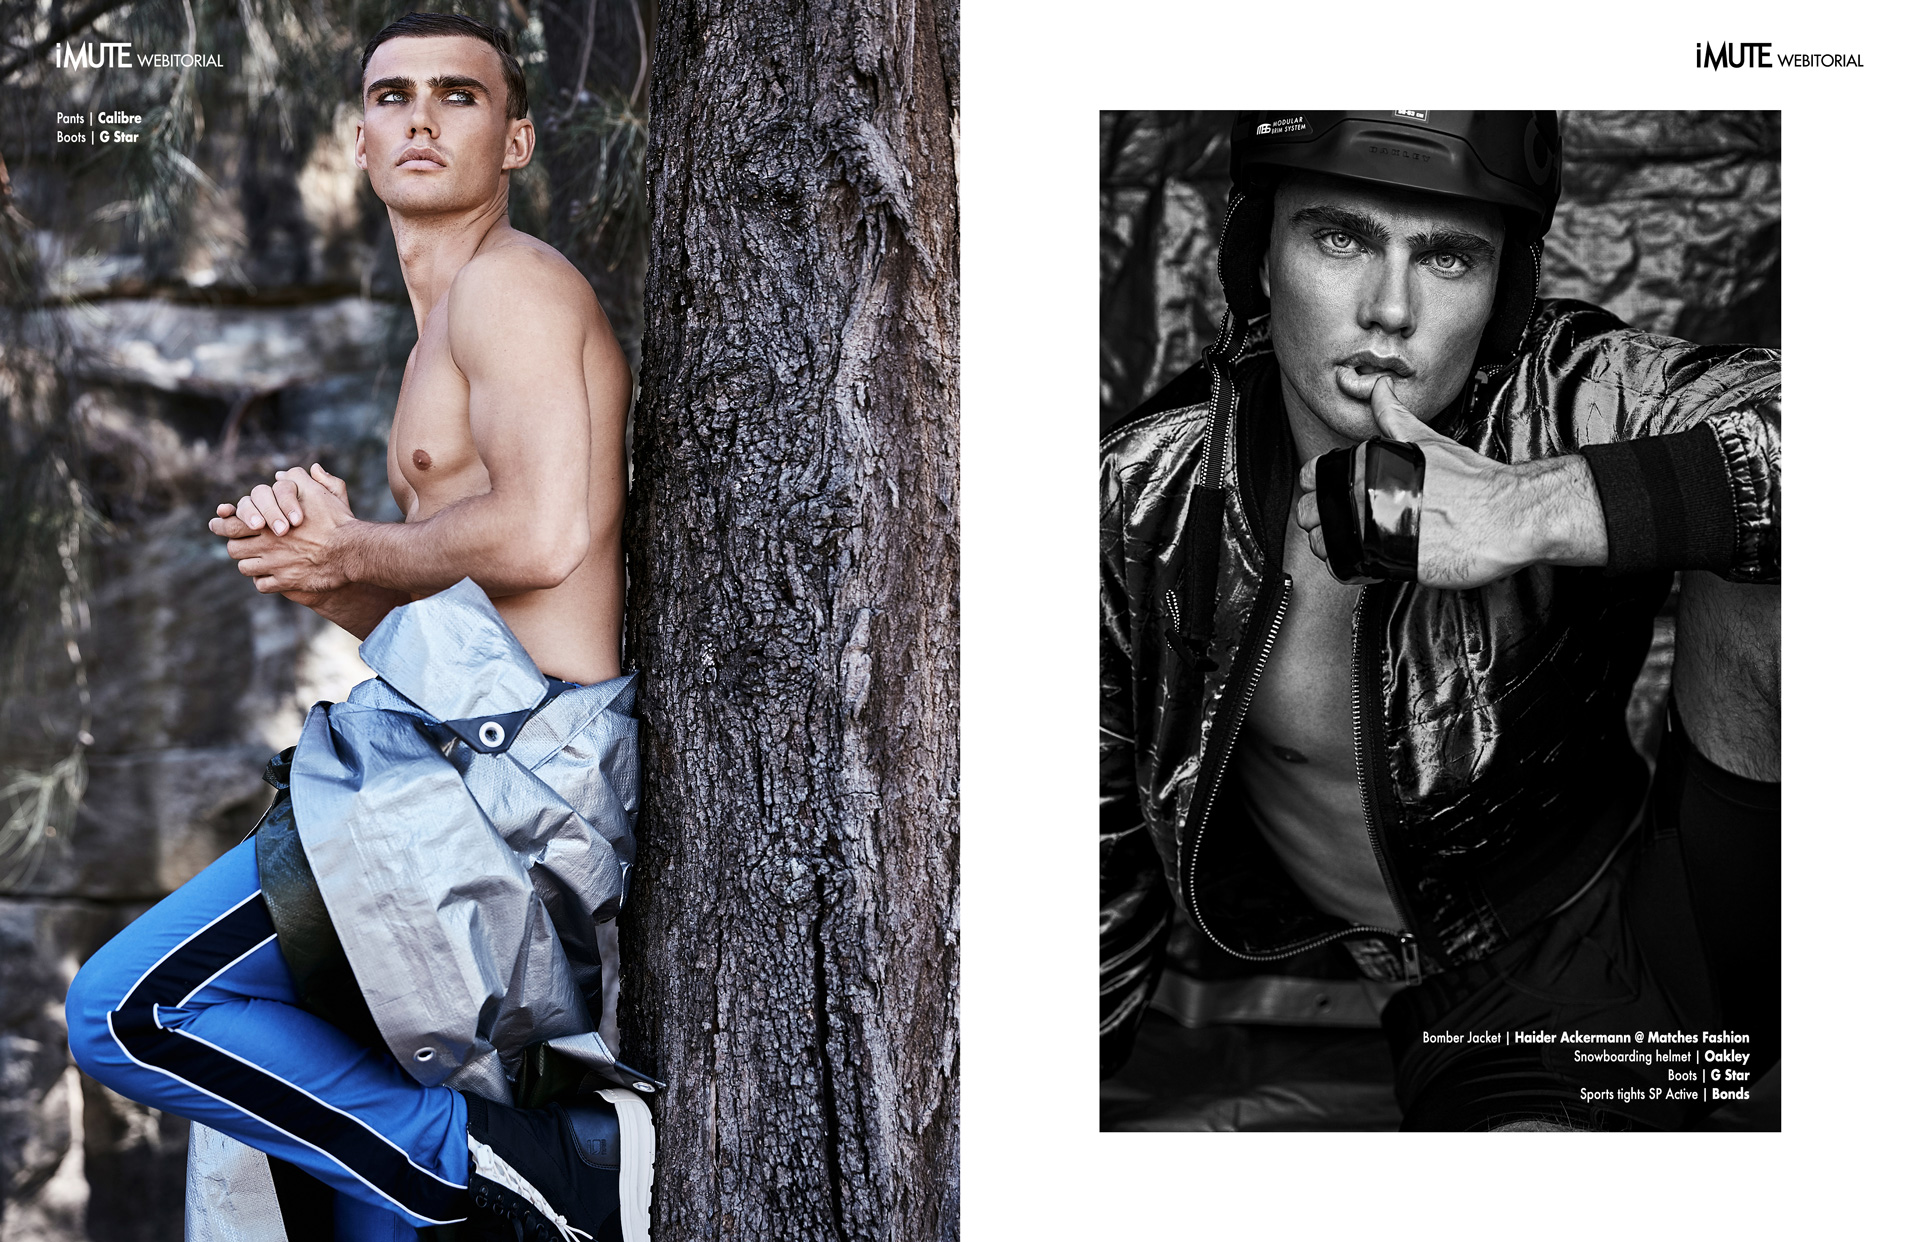 JOURNEYMAN webitorial for iMute Magazine Photographer|Peter Brew Bevan @ work:agency Model| Jordan Barron @Chic Management Stylist|Emma Cotterill Grooming|Chris Arai @ Talentland